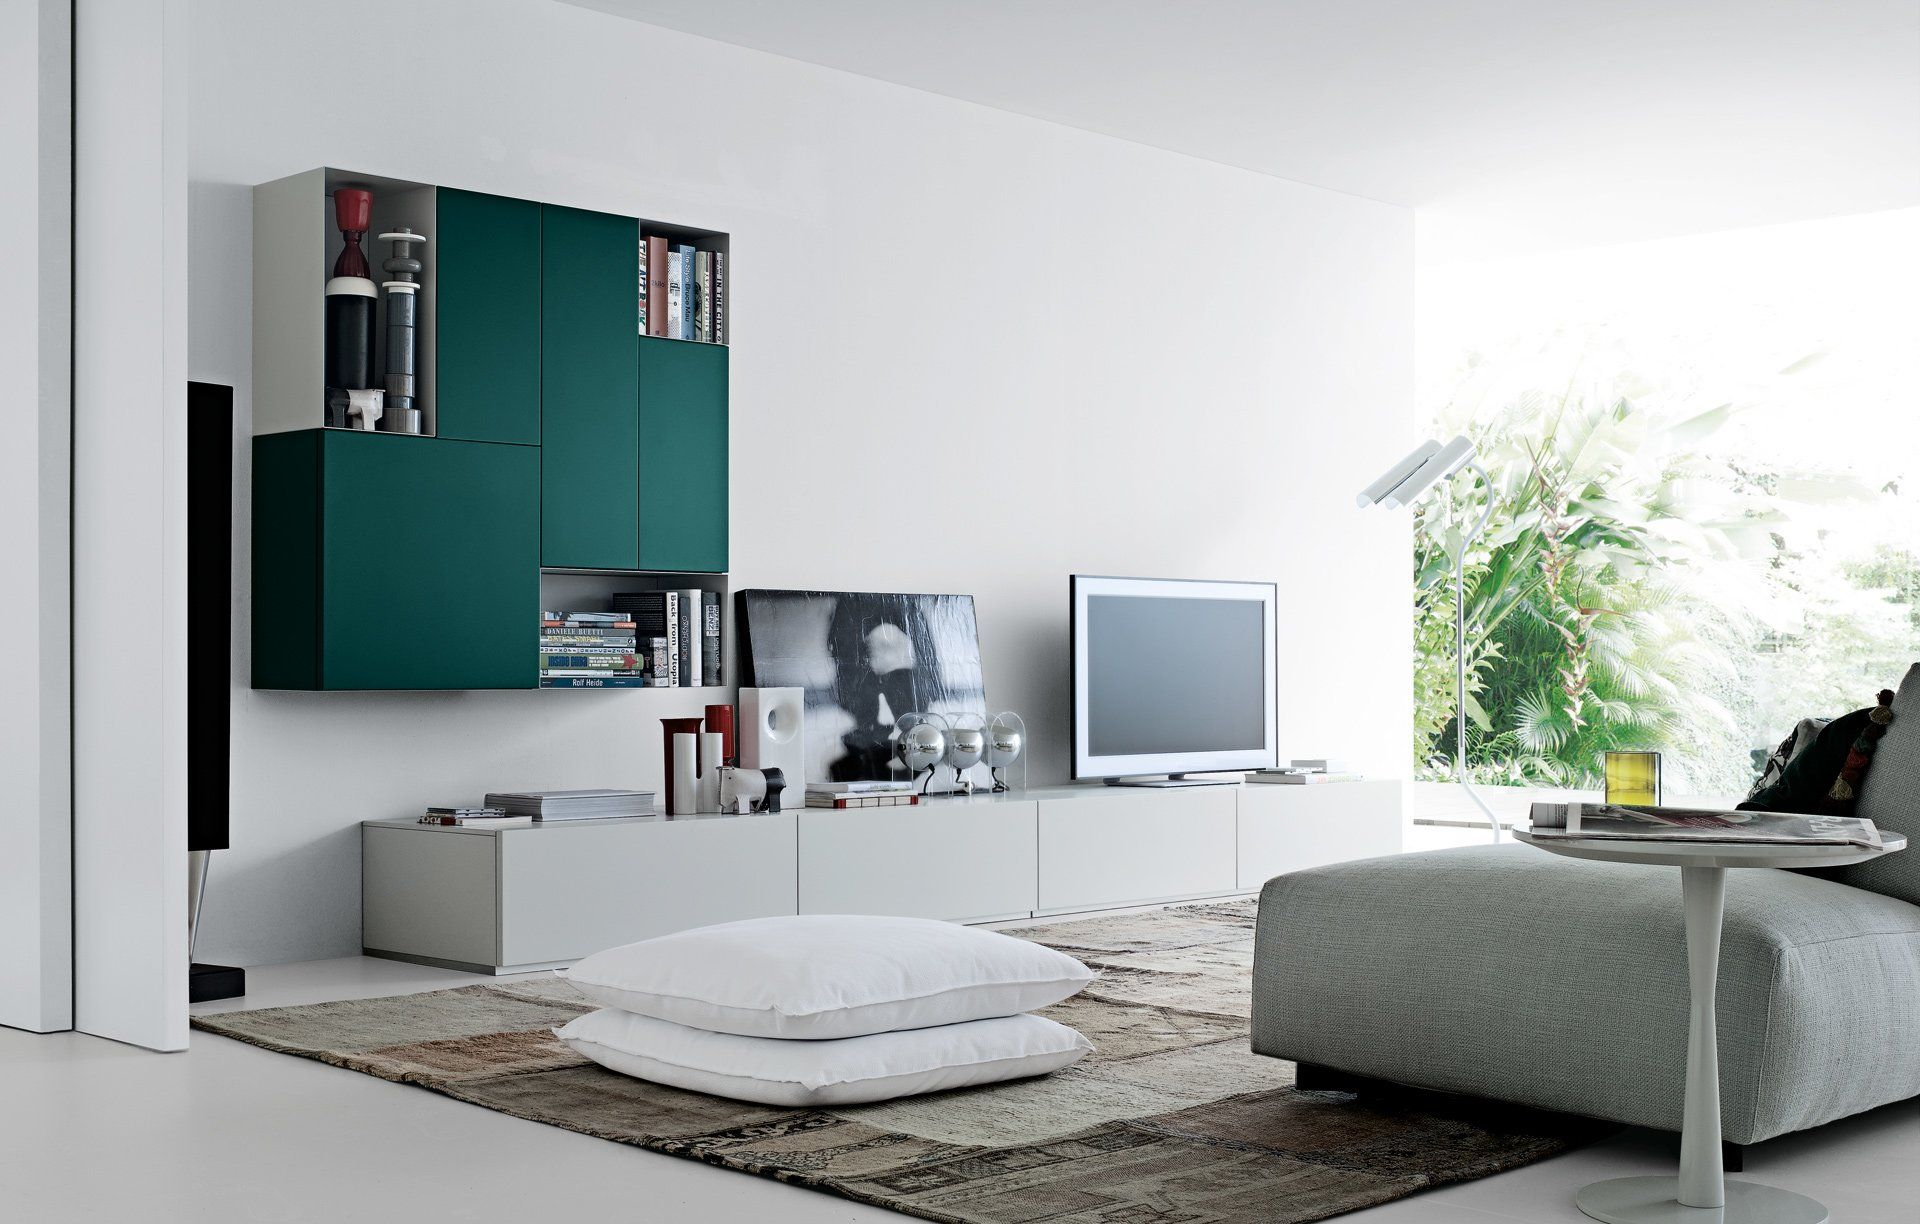 Sintesi - Poliform - Italy Interior Design - Zucchi Arredamenti